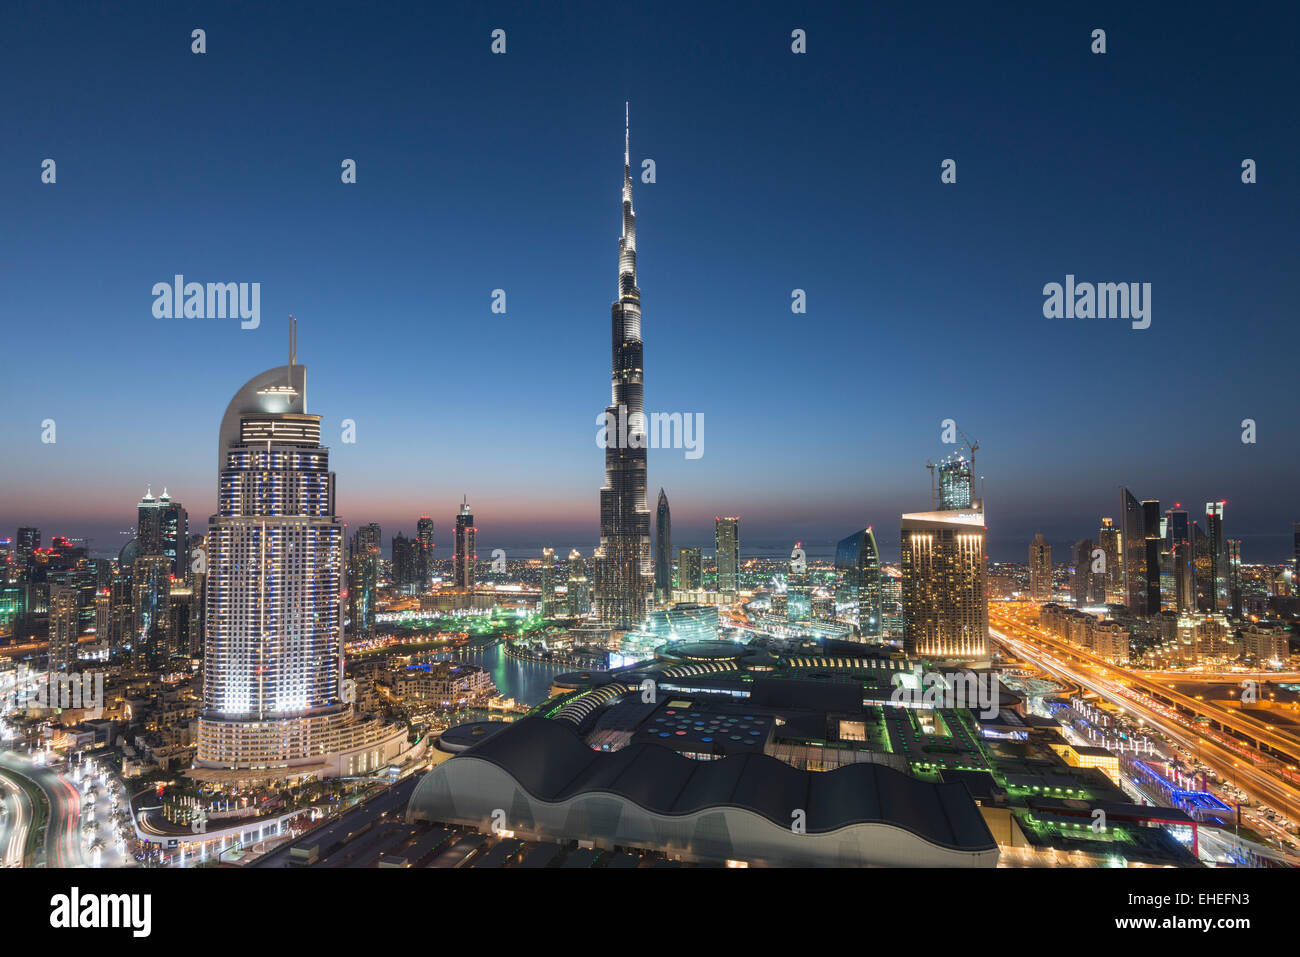 Burj Khalifa , the Dubai Mall and skyline of Downtown Dubai at night in United Arab Emirates - Stock Image